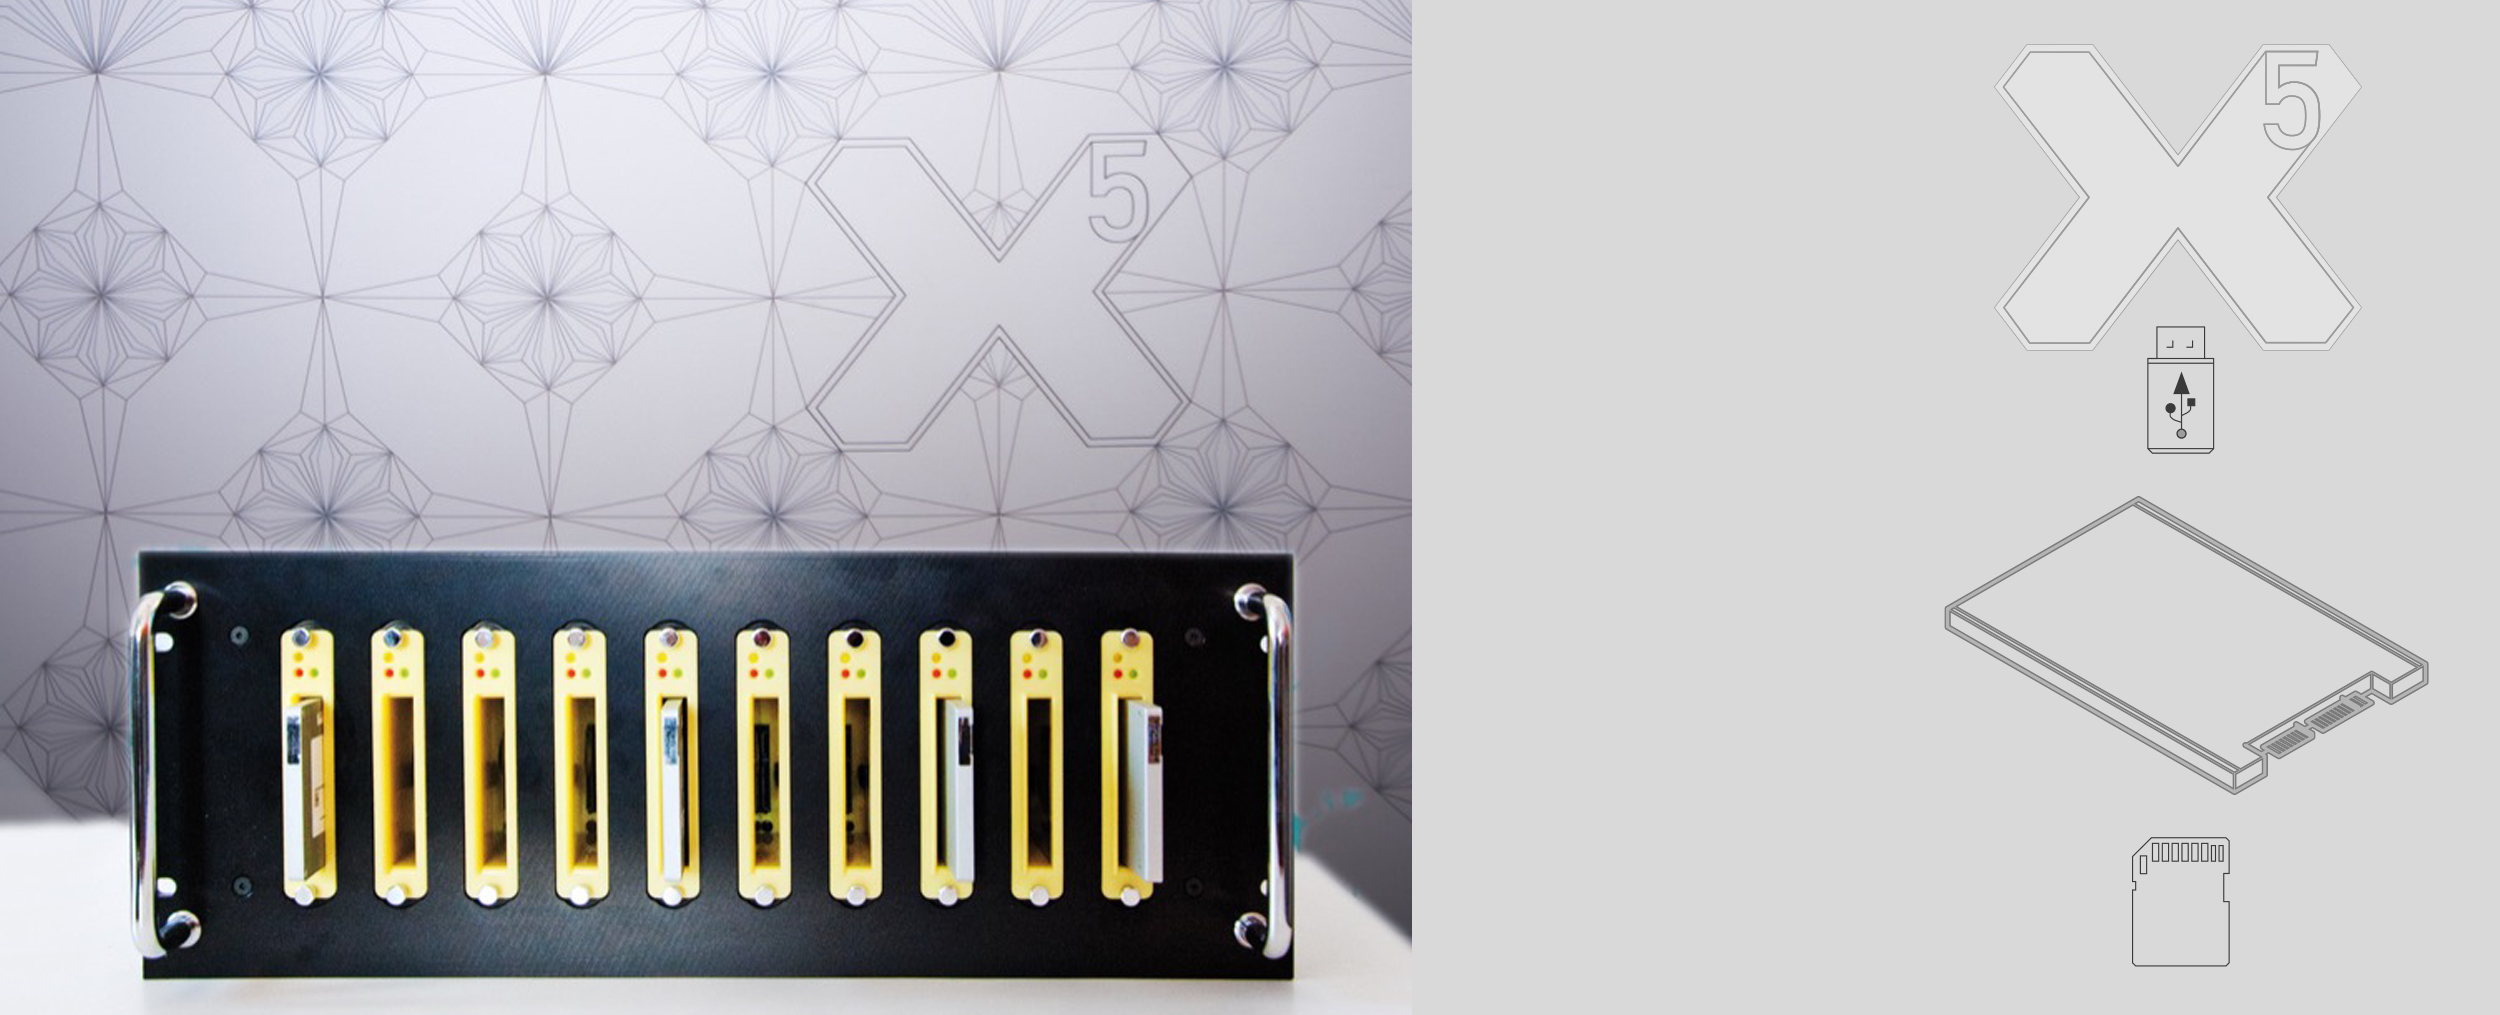 X5 Kopiersystem für SSD, CF, Flash, USB